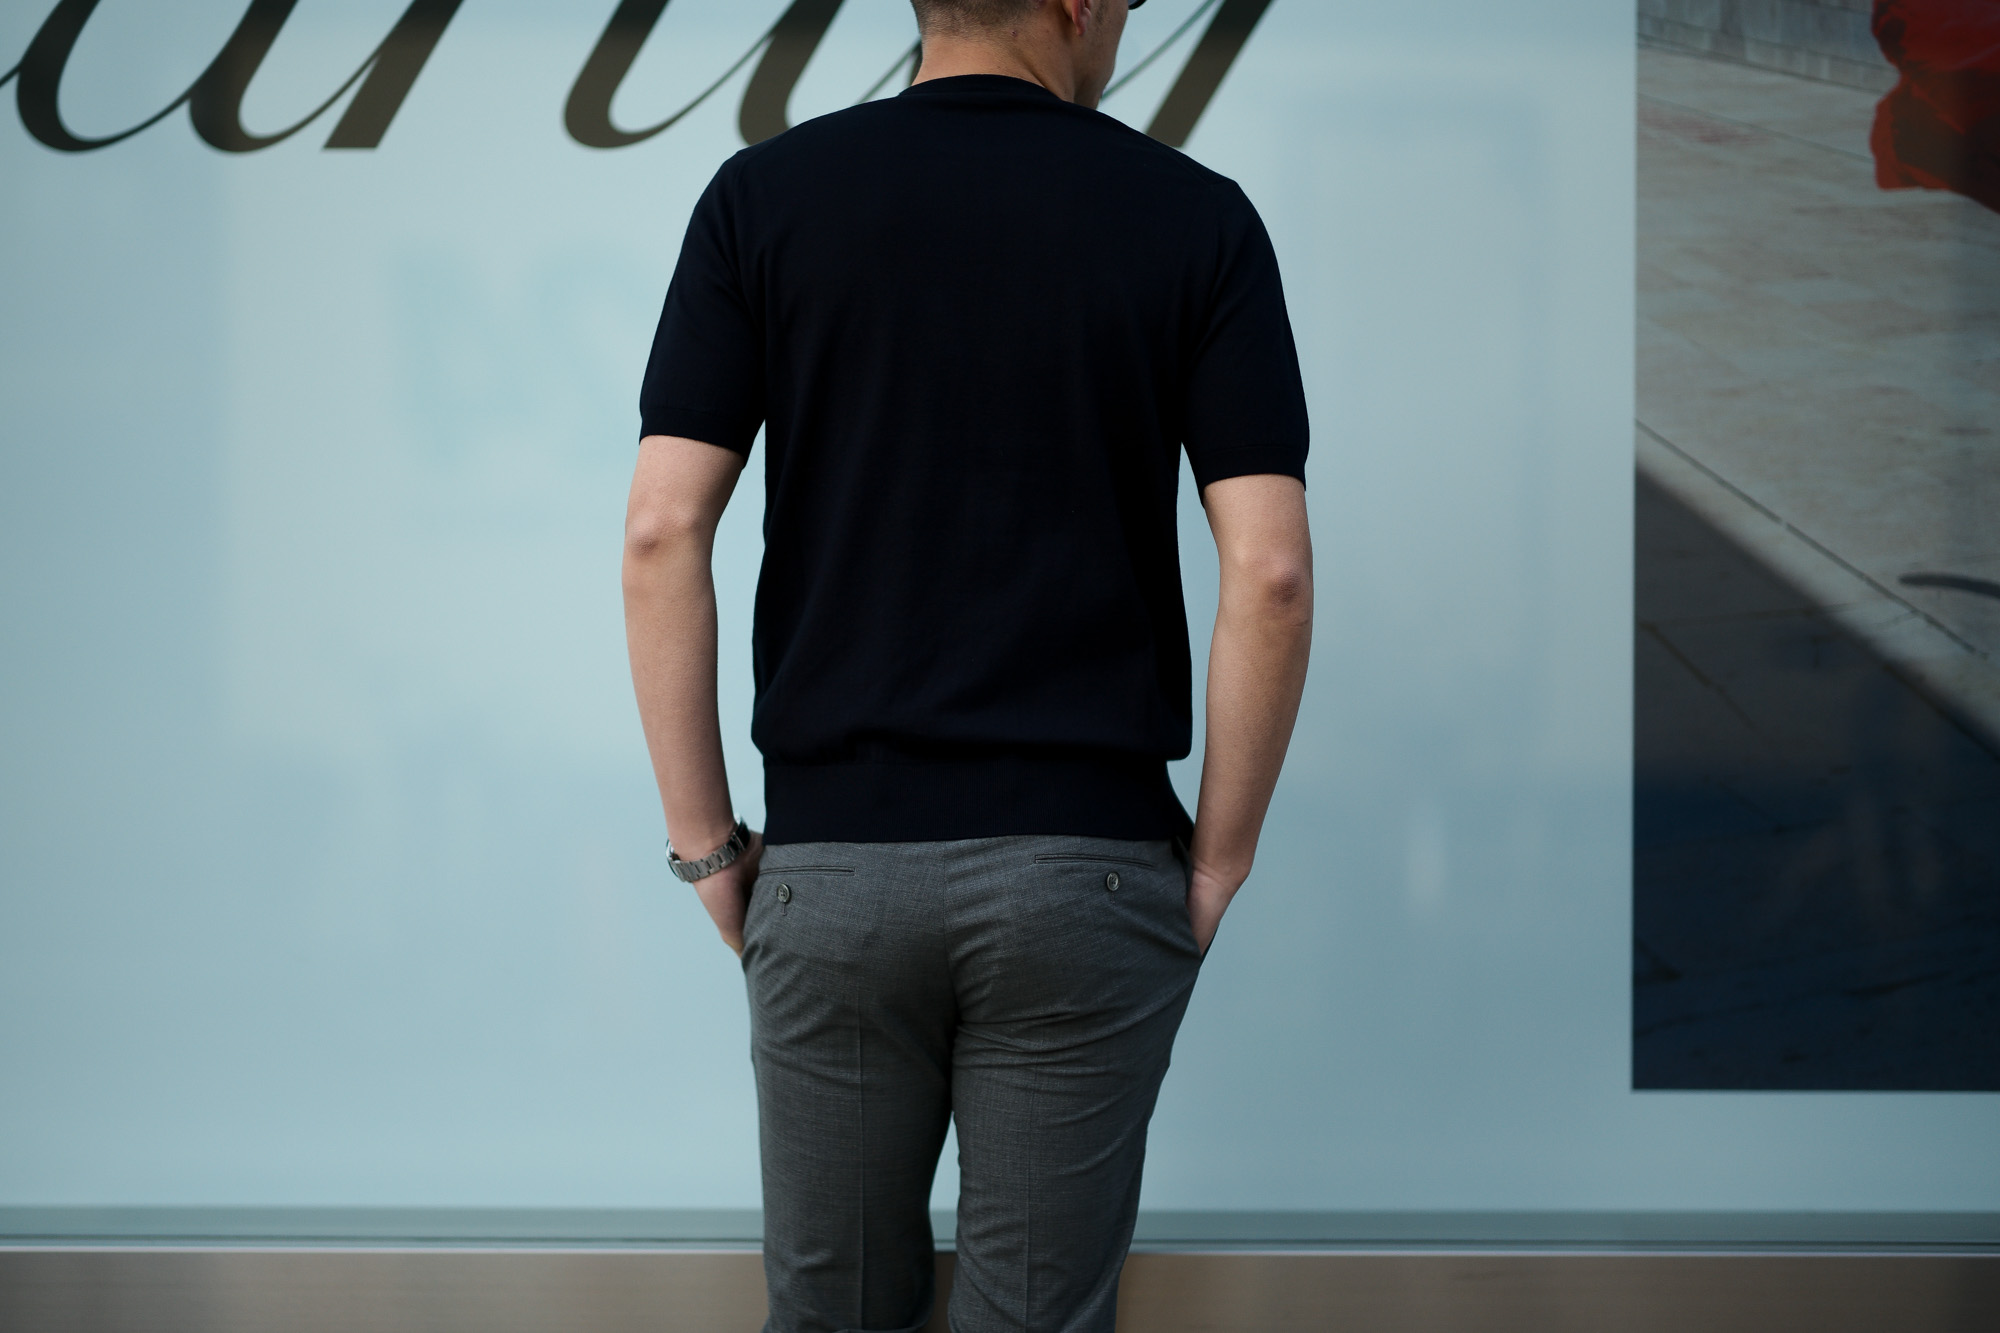 Cruciani(クルチアーニ) 33G Knit T-shirt 33ゲージ コットン ニット Tシャツ NAVY (ネイビー・Z0064)  made in italy (イタリア製) 2020 春夏新作 愛知 名古屋 altoediritto アルトエデリット ニットTEE